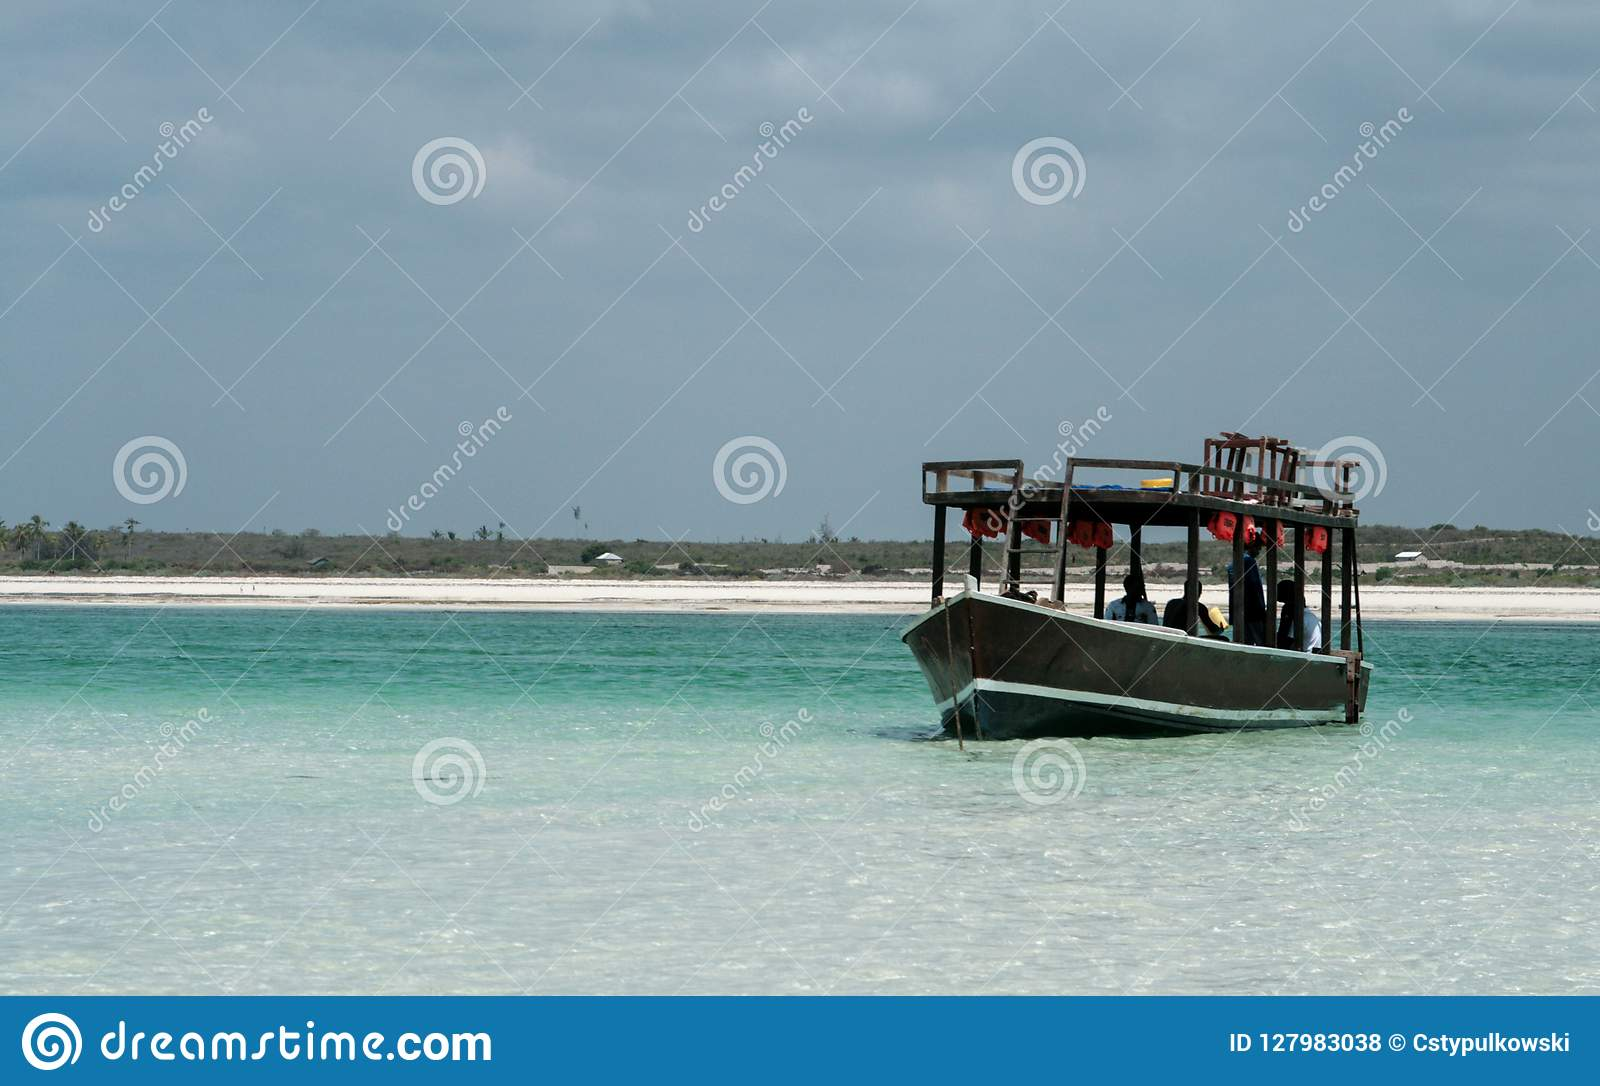 Kenia, Mombasa, 03/25/2018 - Boote auf Ozean